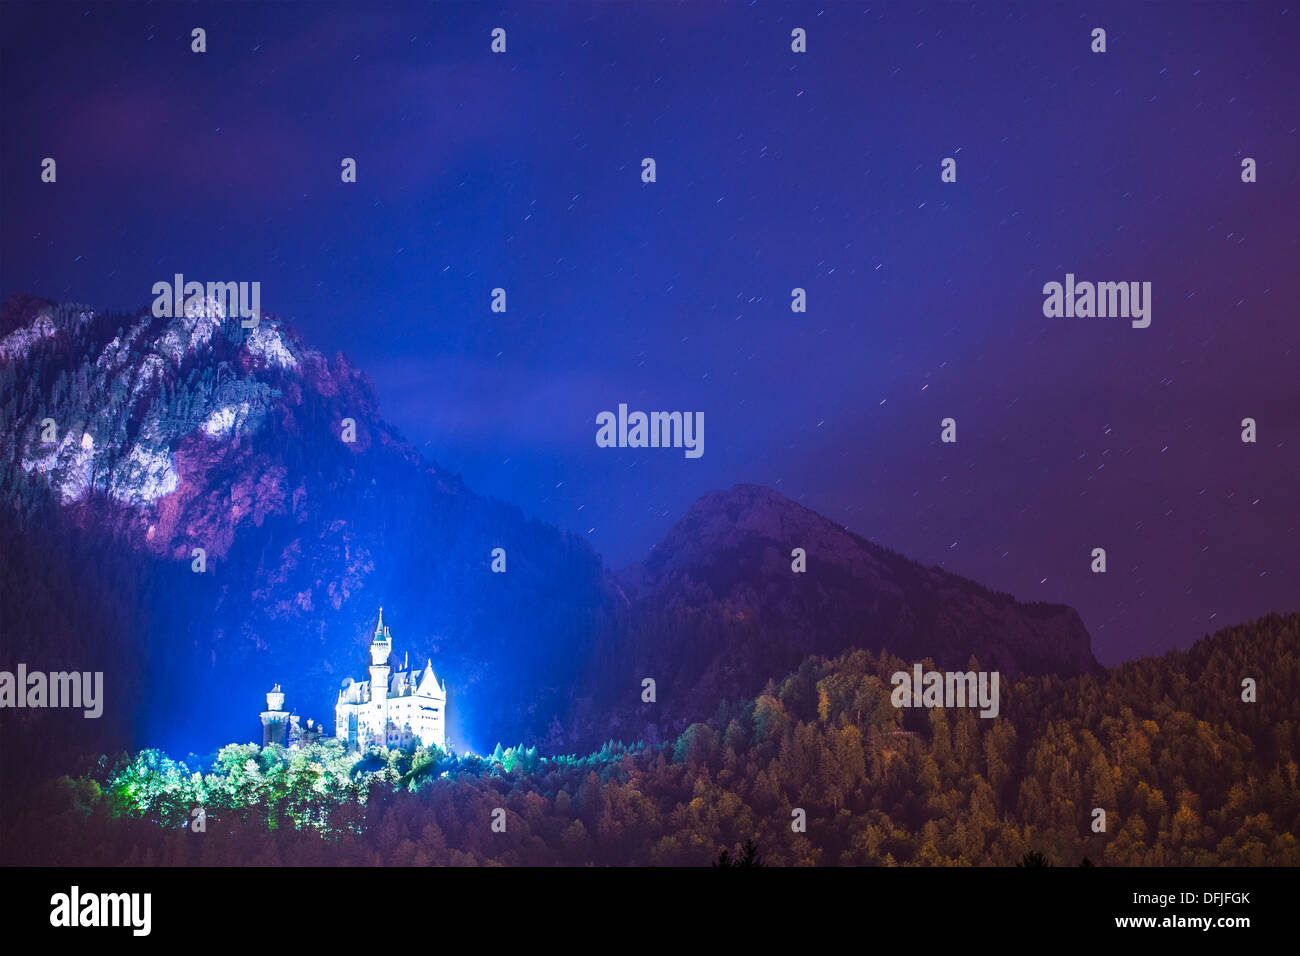 Neuschwanstein Castle at night in Fussen, Germany. - Stock Image